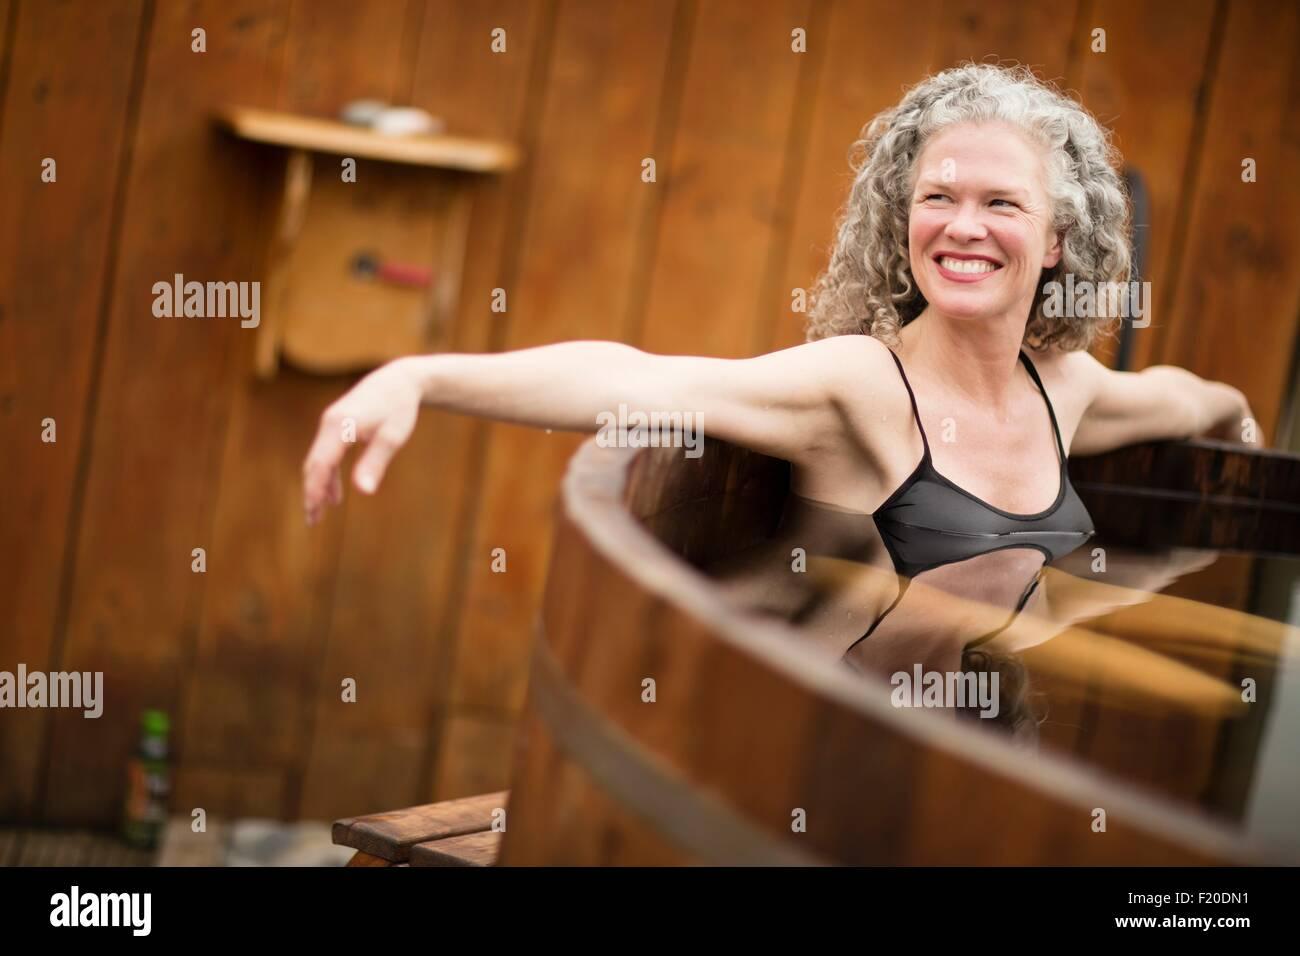 Reife Frau im Whirlpool bei Eco Retreat lächelnd Stockbild